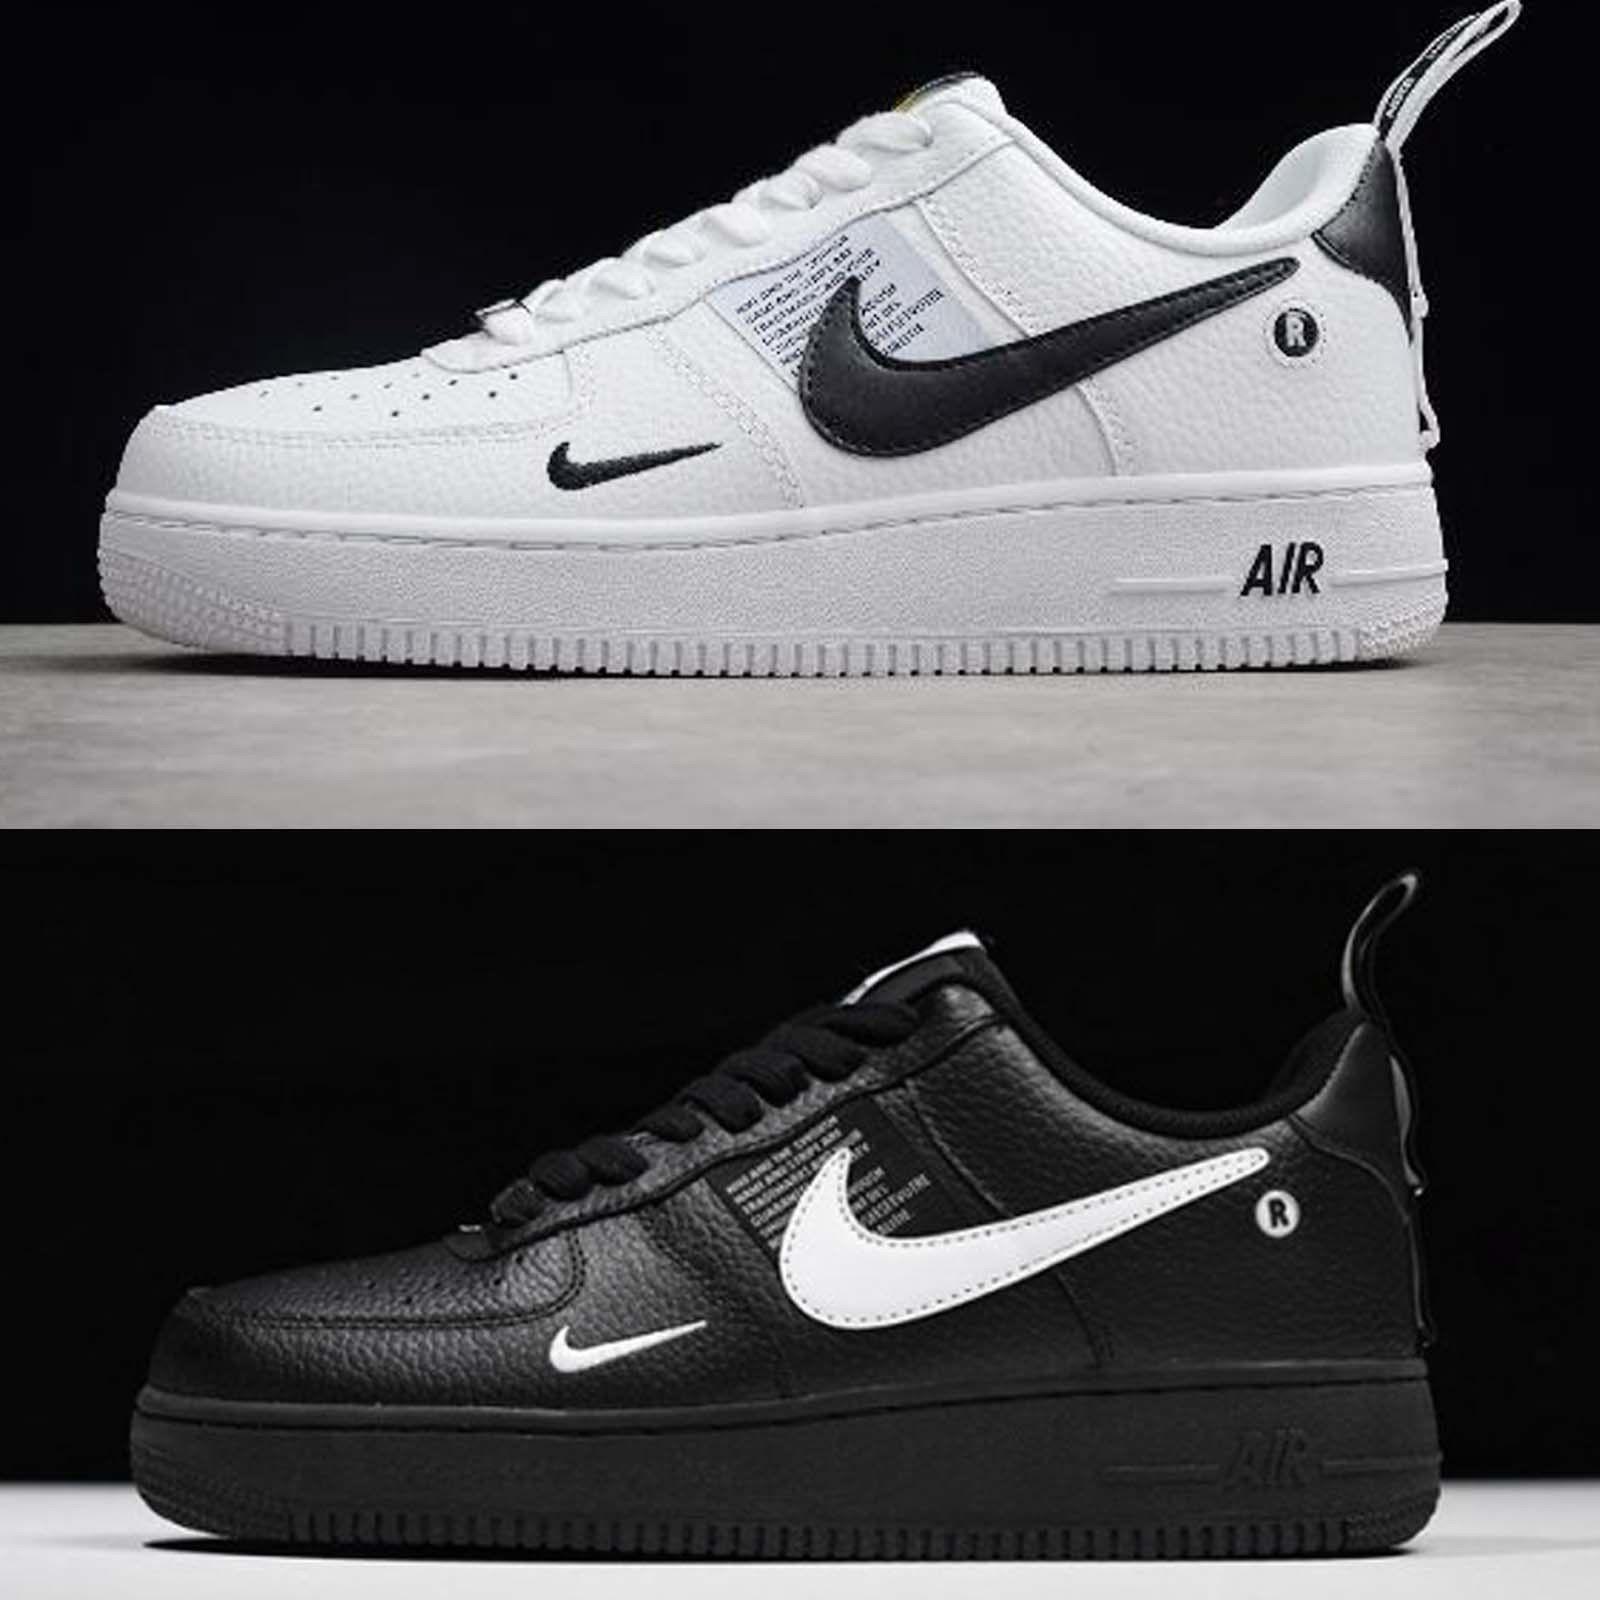 137 64 Nike Air Force 1 07 Lv8 Utility Black White Mens Women Shoes Sneakers New Wi Zapatos Hombre Moda Zapatillas Nike Blancas